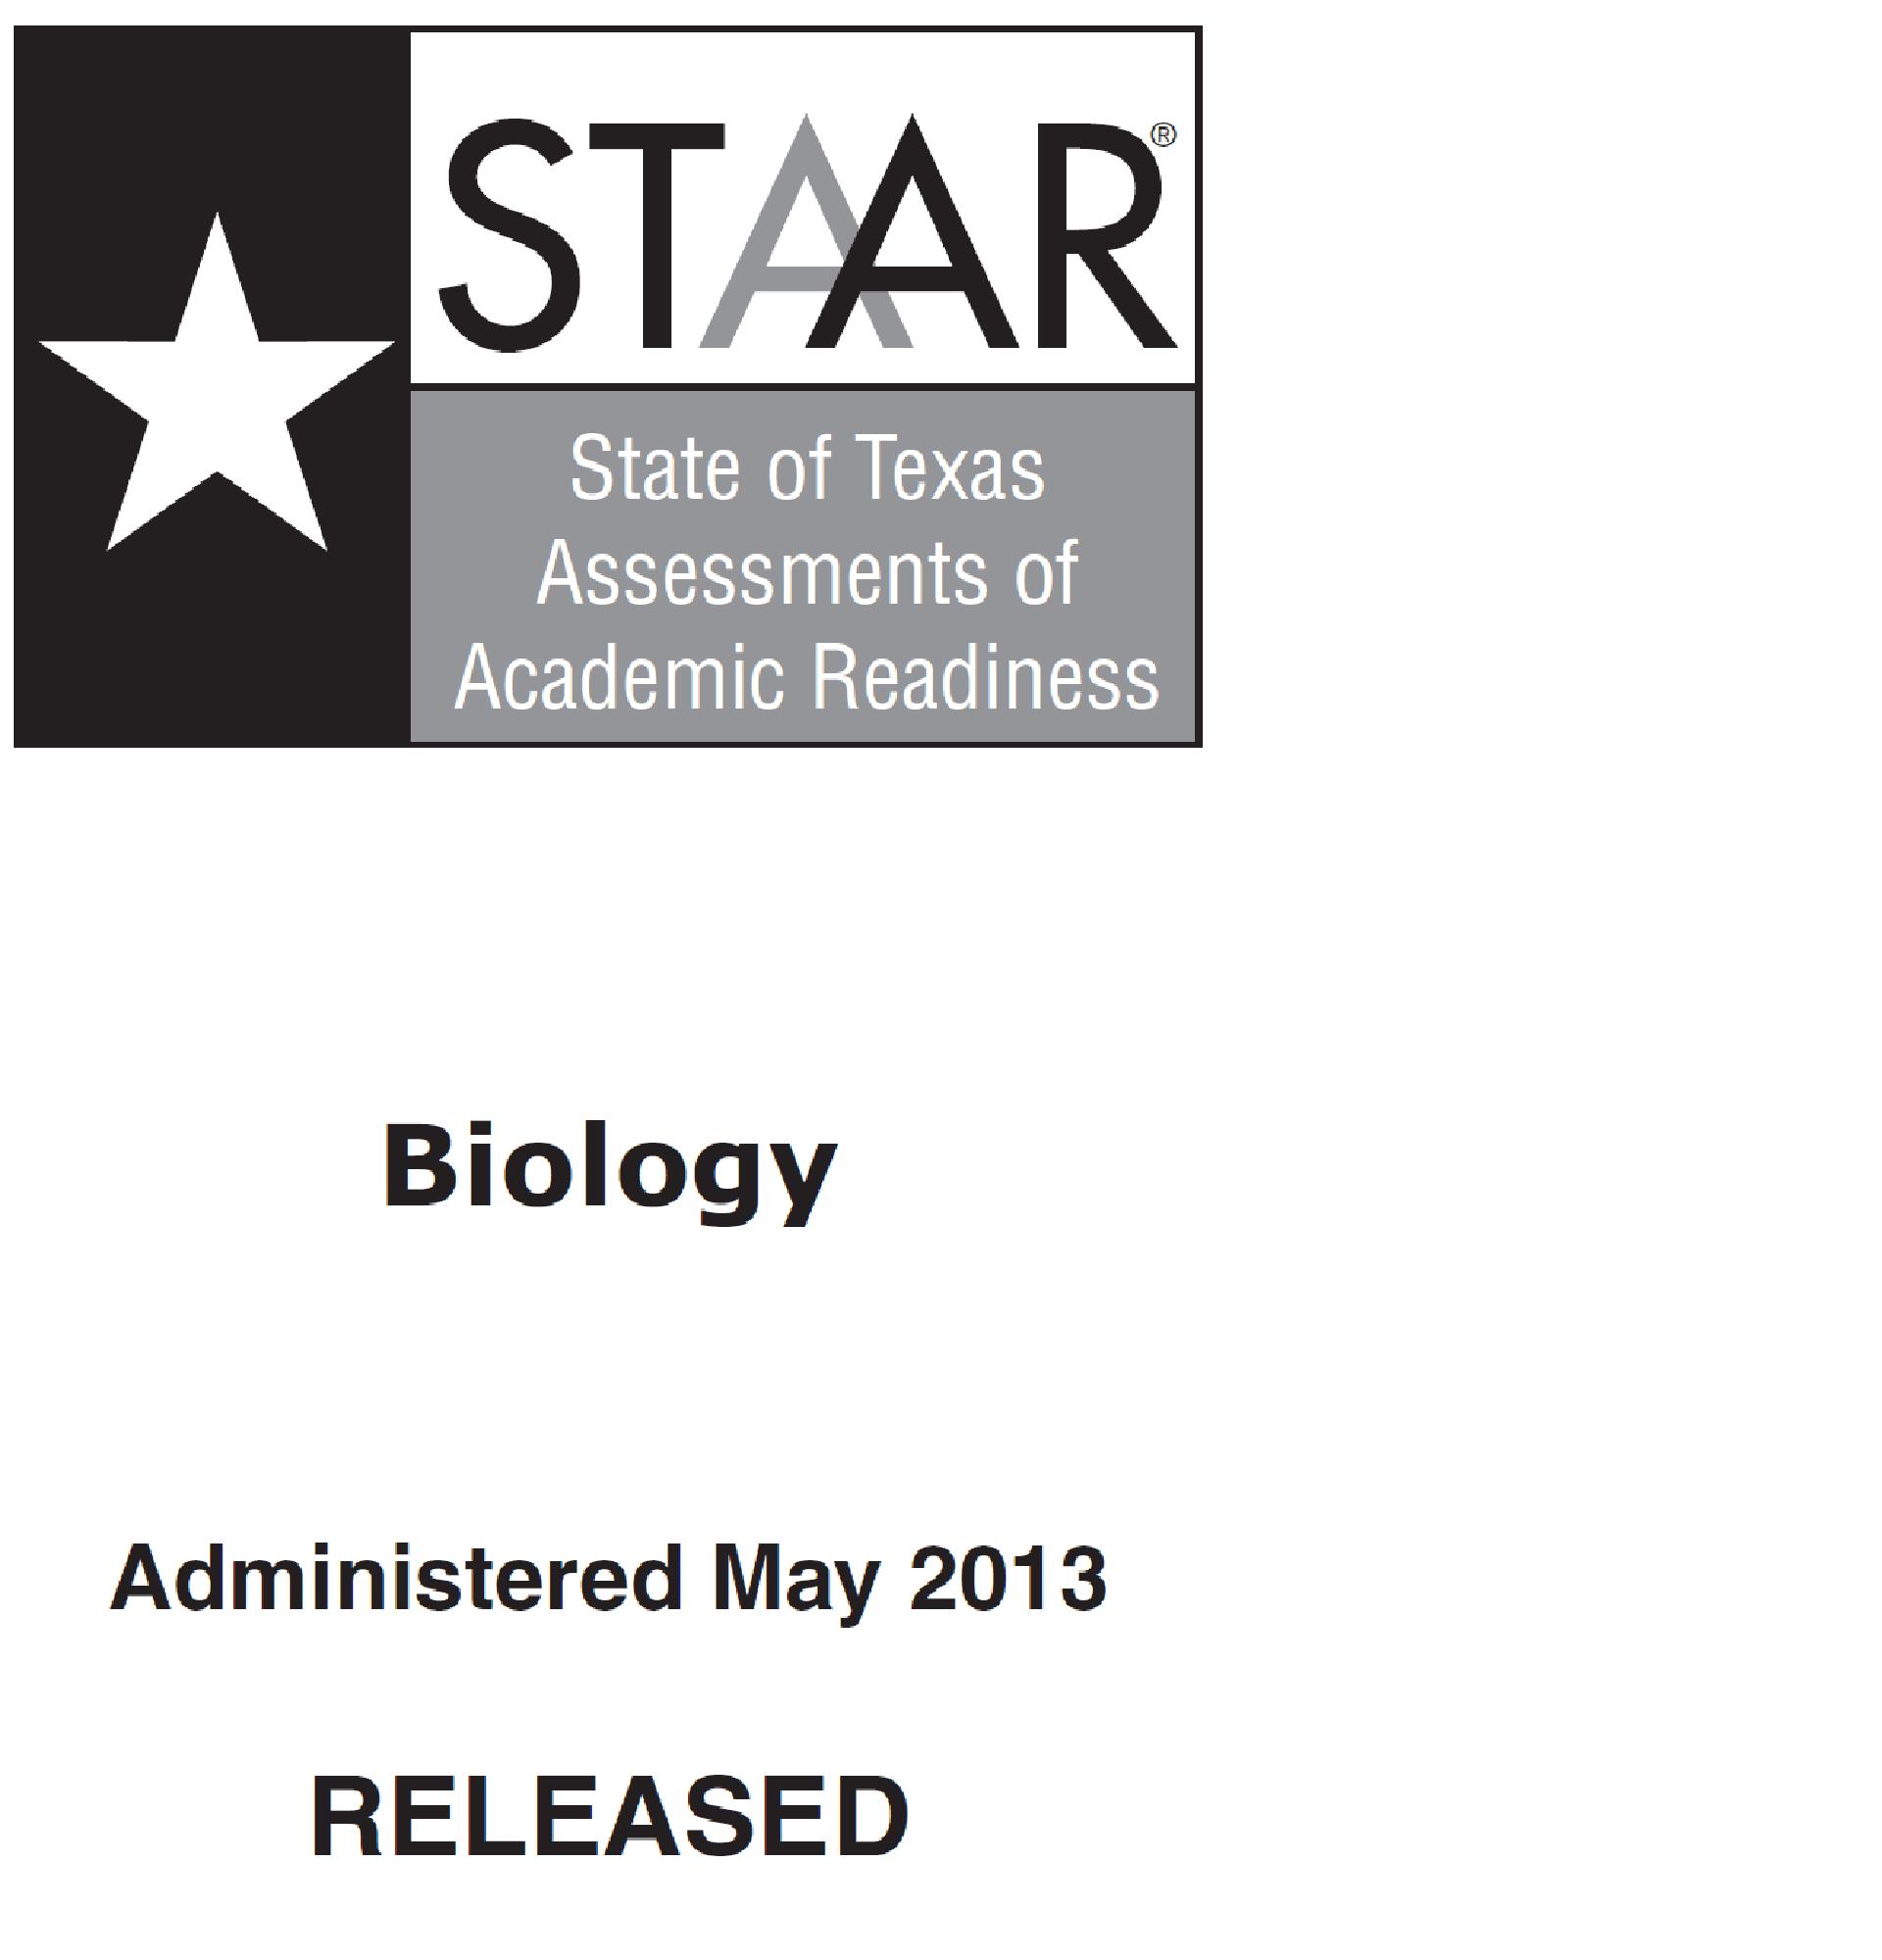 STAAR EOC 2013 Biology (FULL) | Biology Quiz - Quizizz